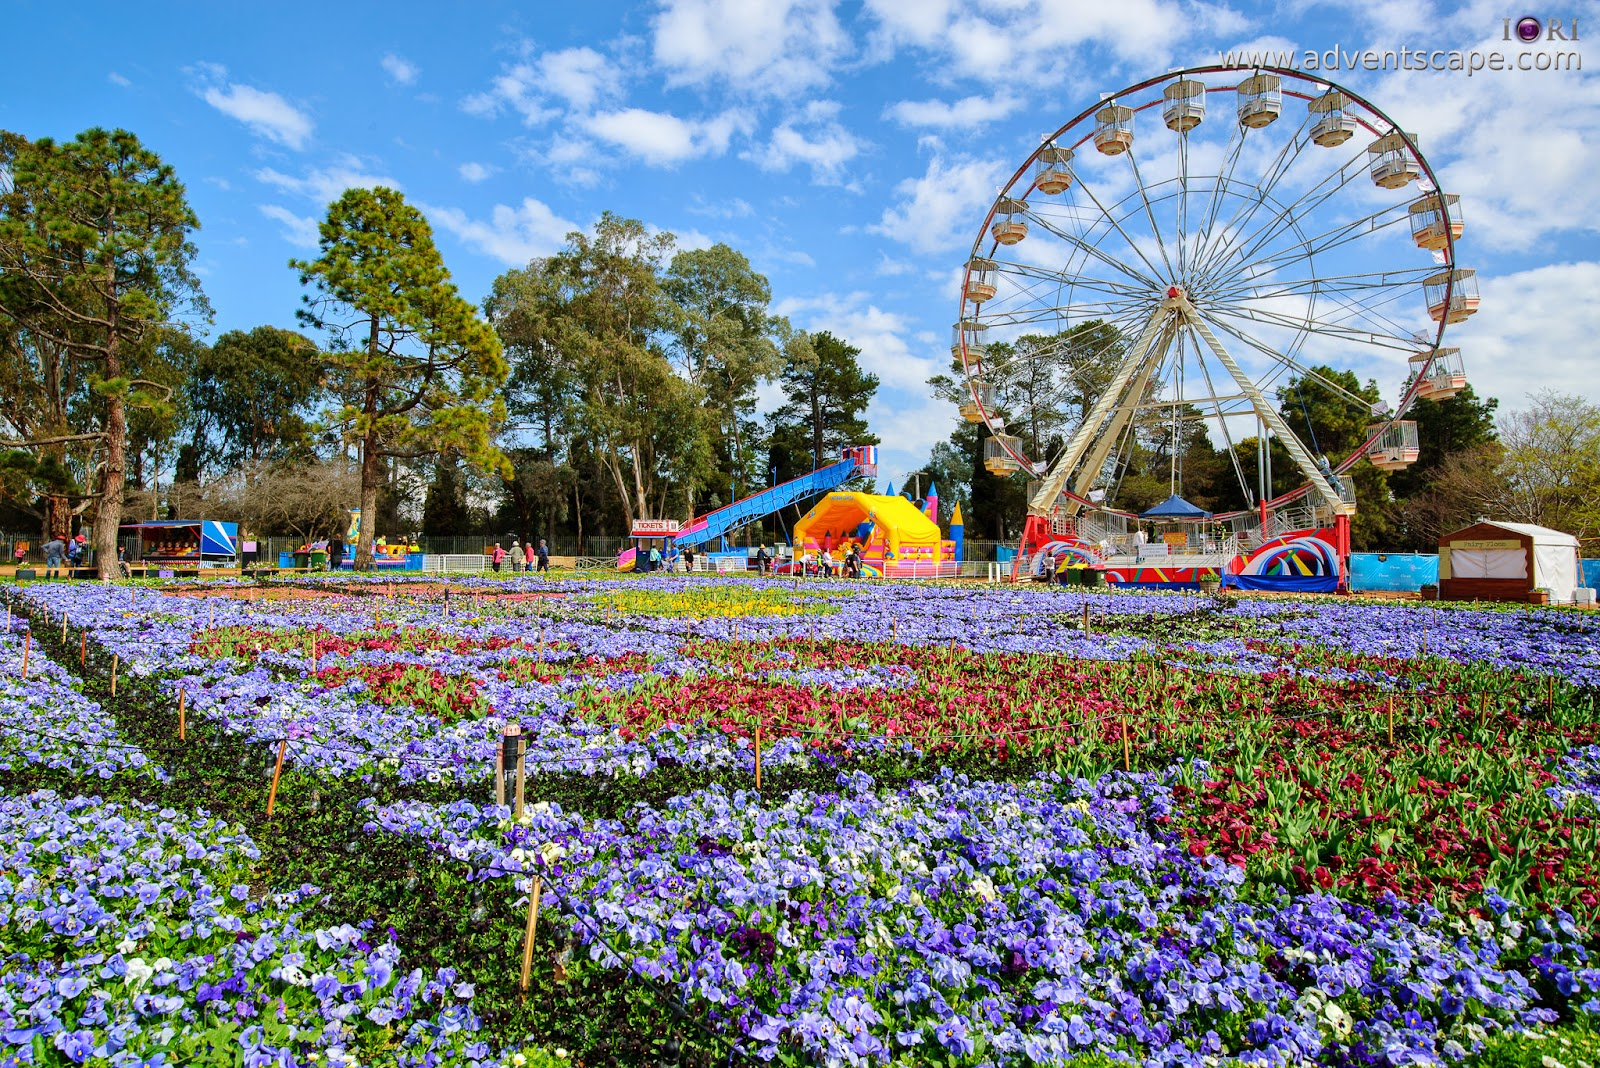 Philip Avellana, iori, advenscape, Floriade, 2014, spring festival, Canberra, ACT, Australian Capital Territory, park, flowers, blossom, iconic